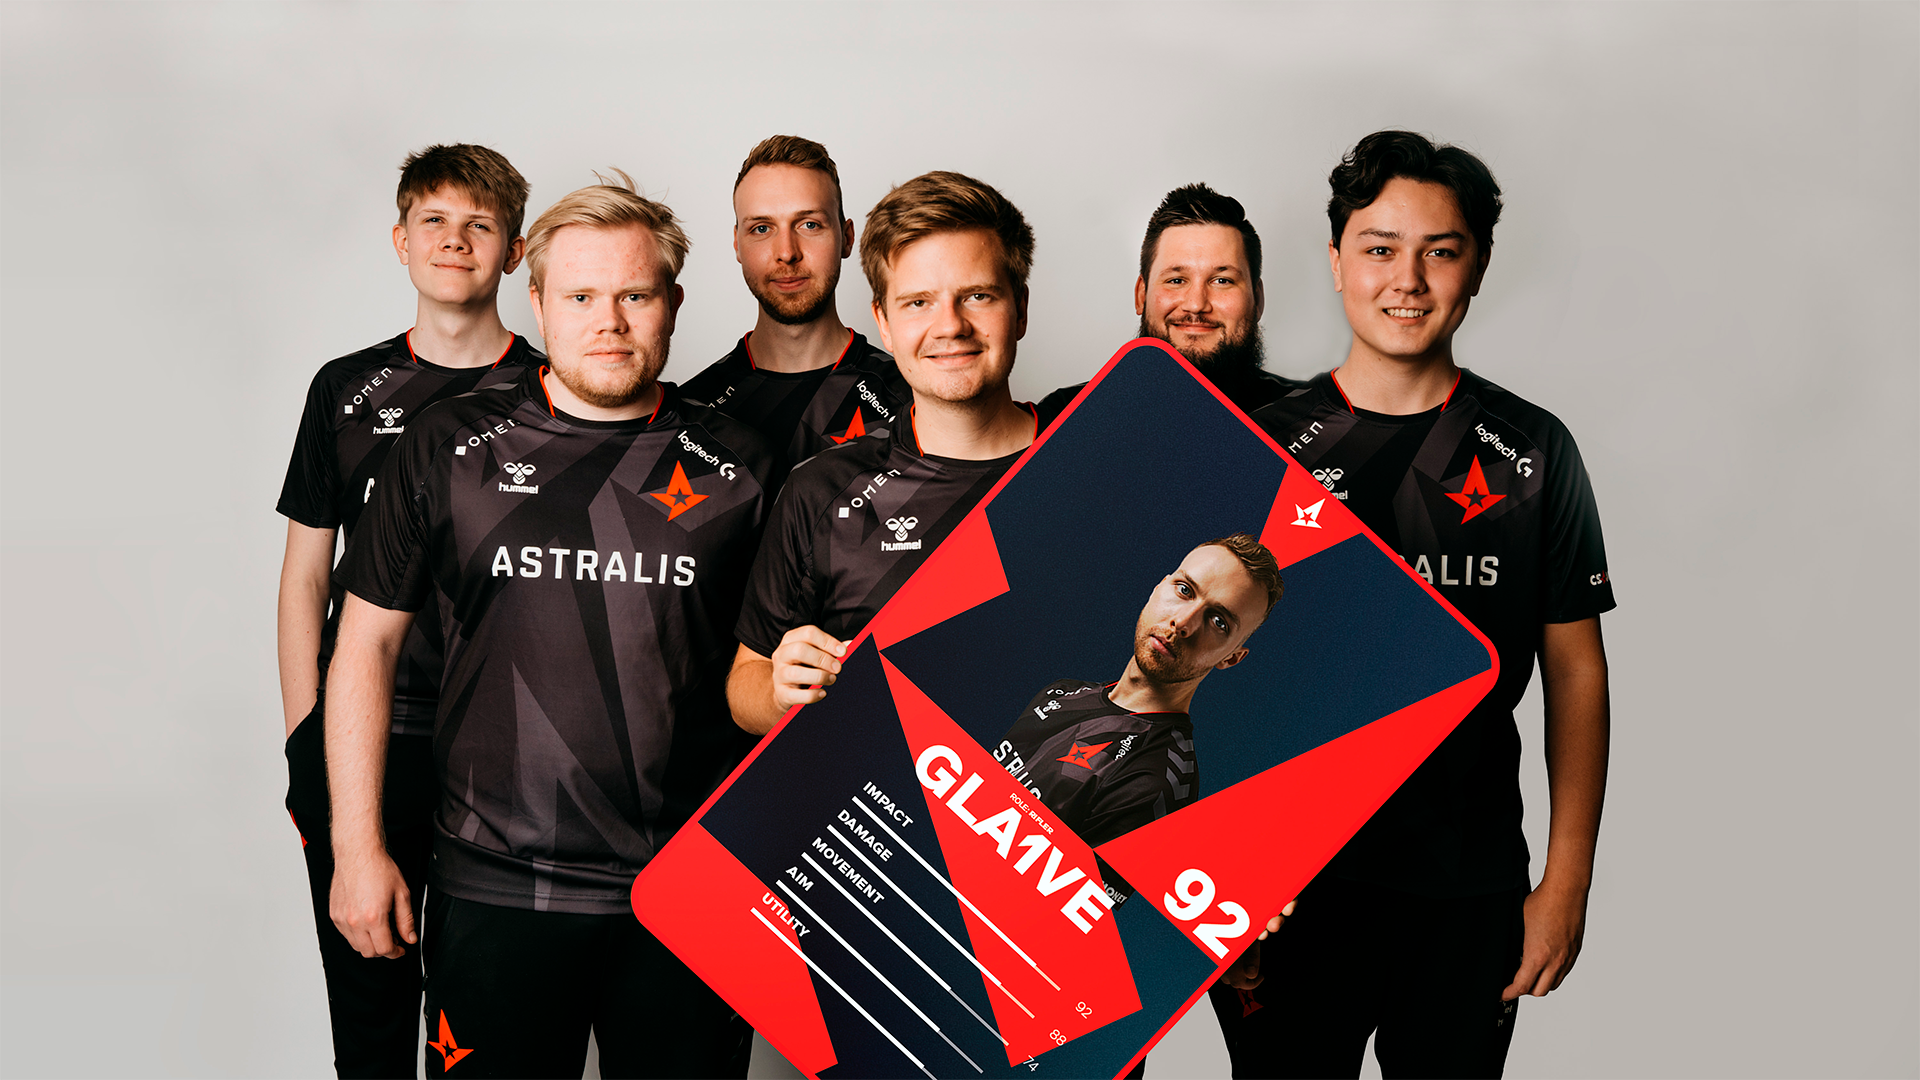 Astralis launches partnership with Danish MyEsportsCard